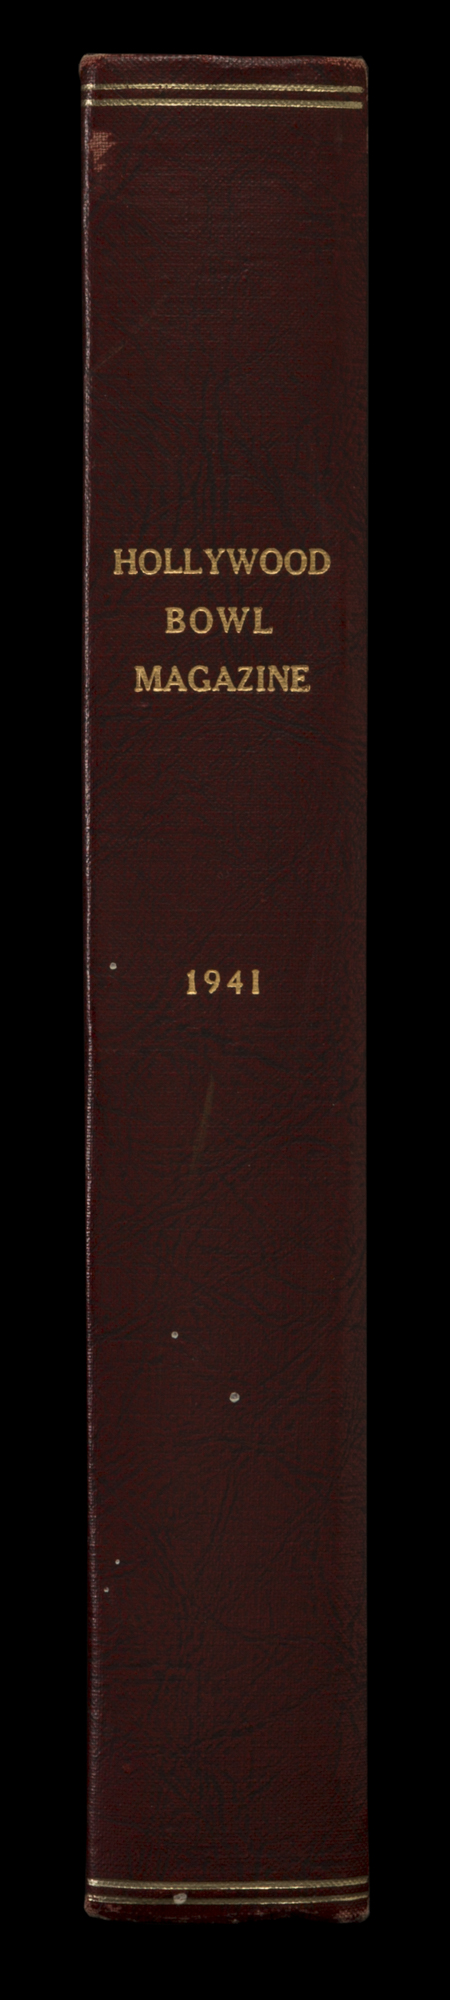 HB_ProgramBook_Spine_1941.jpg